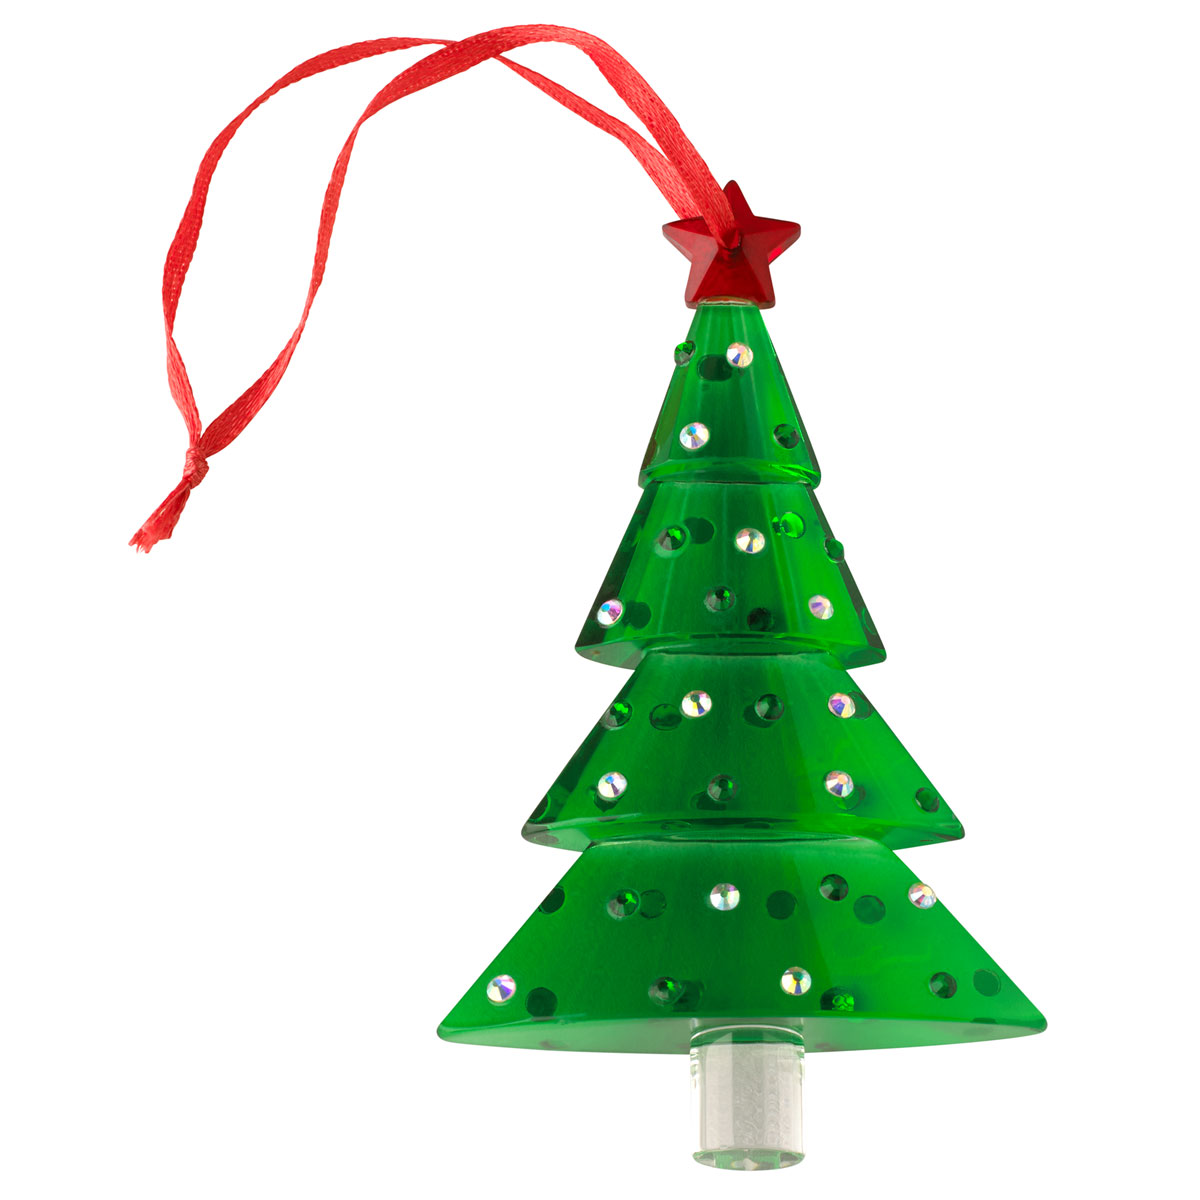 Villeroy and Boch 2020 Crystal Gems Green Tree Ornament